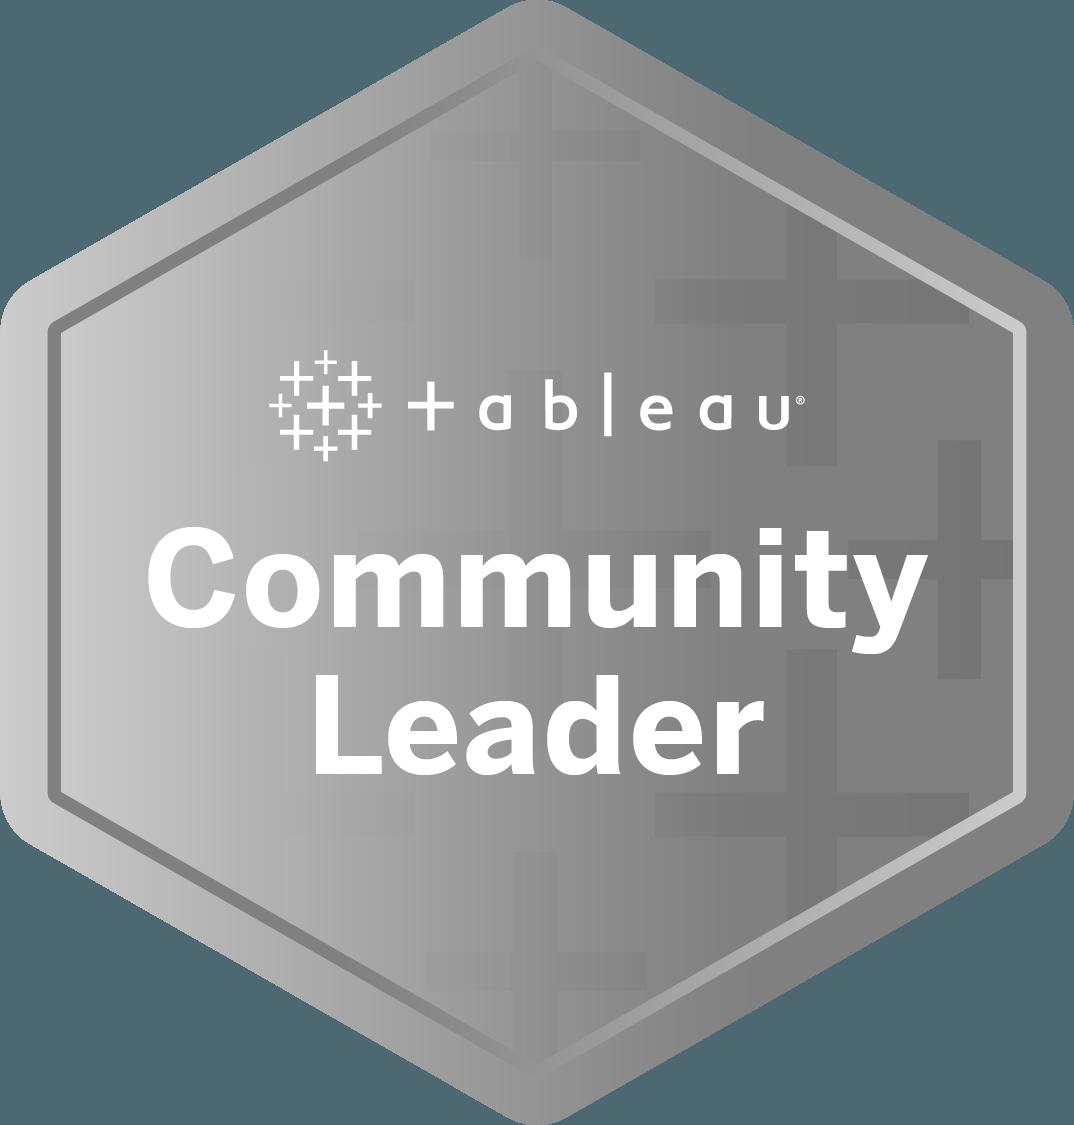 Community Leader badge